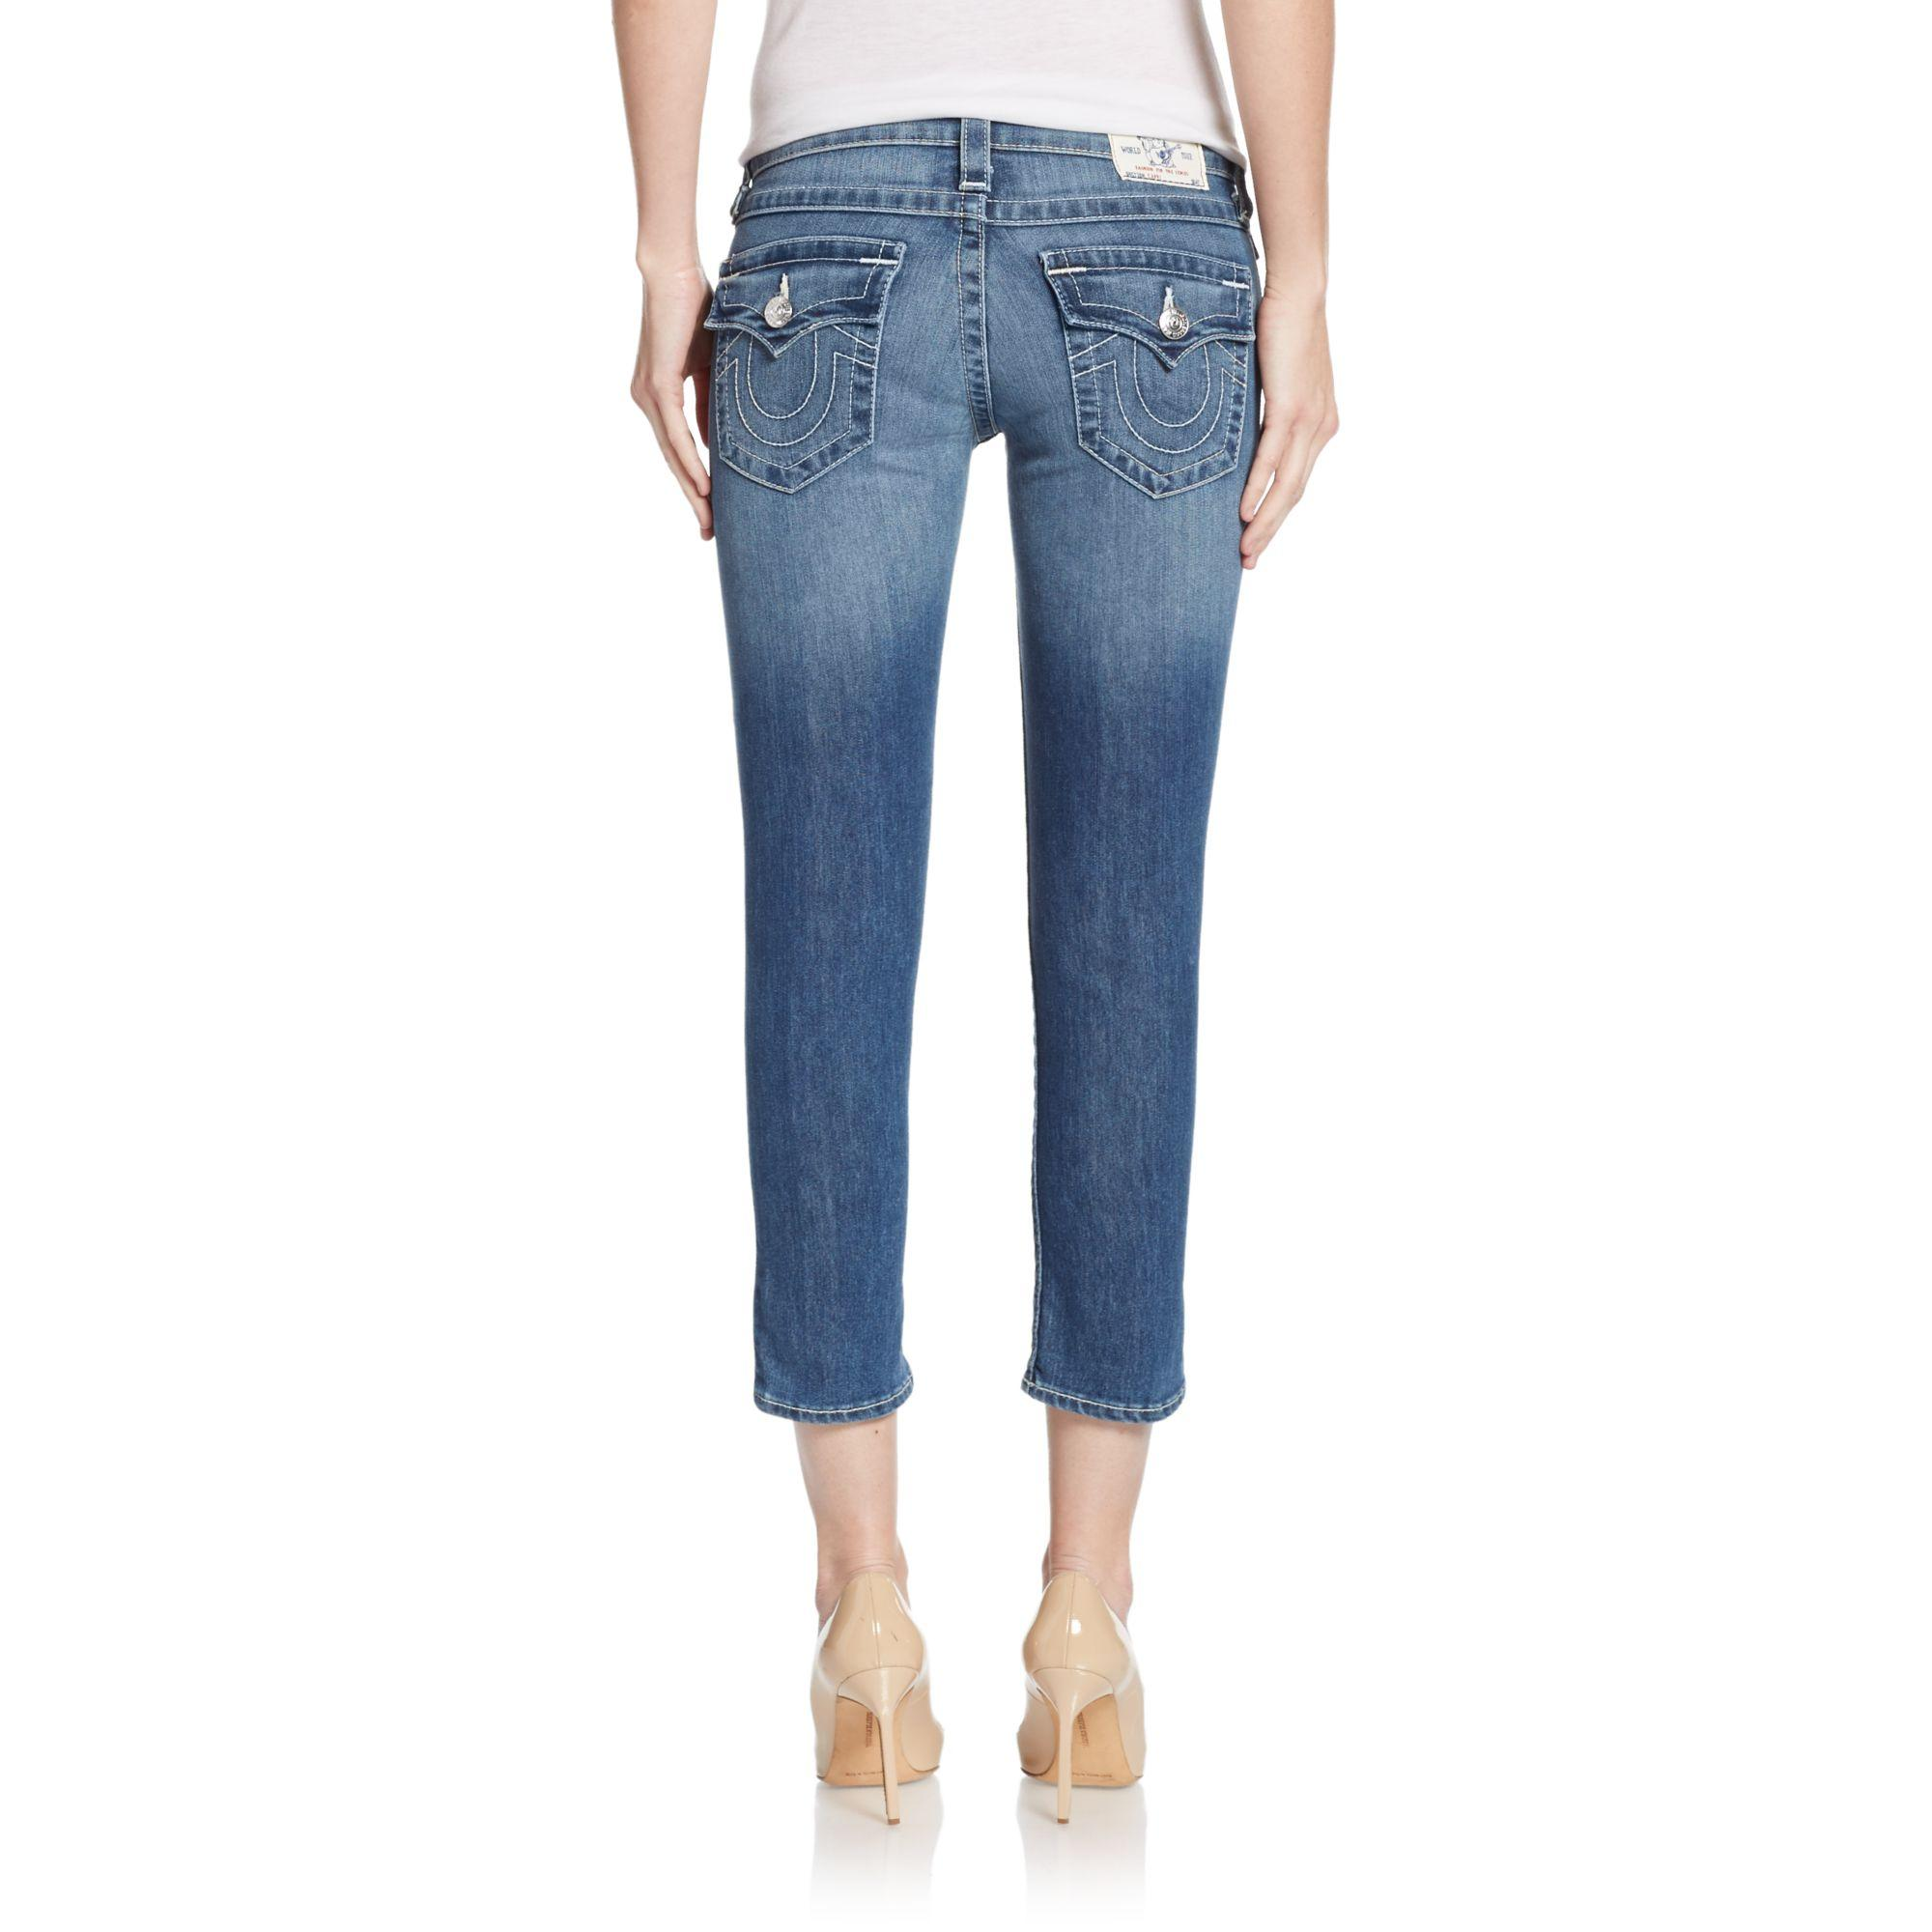 True Religion Rolled Capri Jeans in Blue